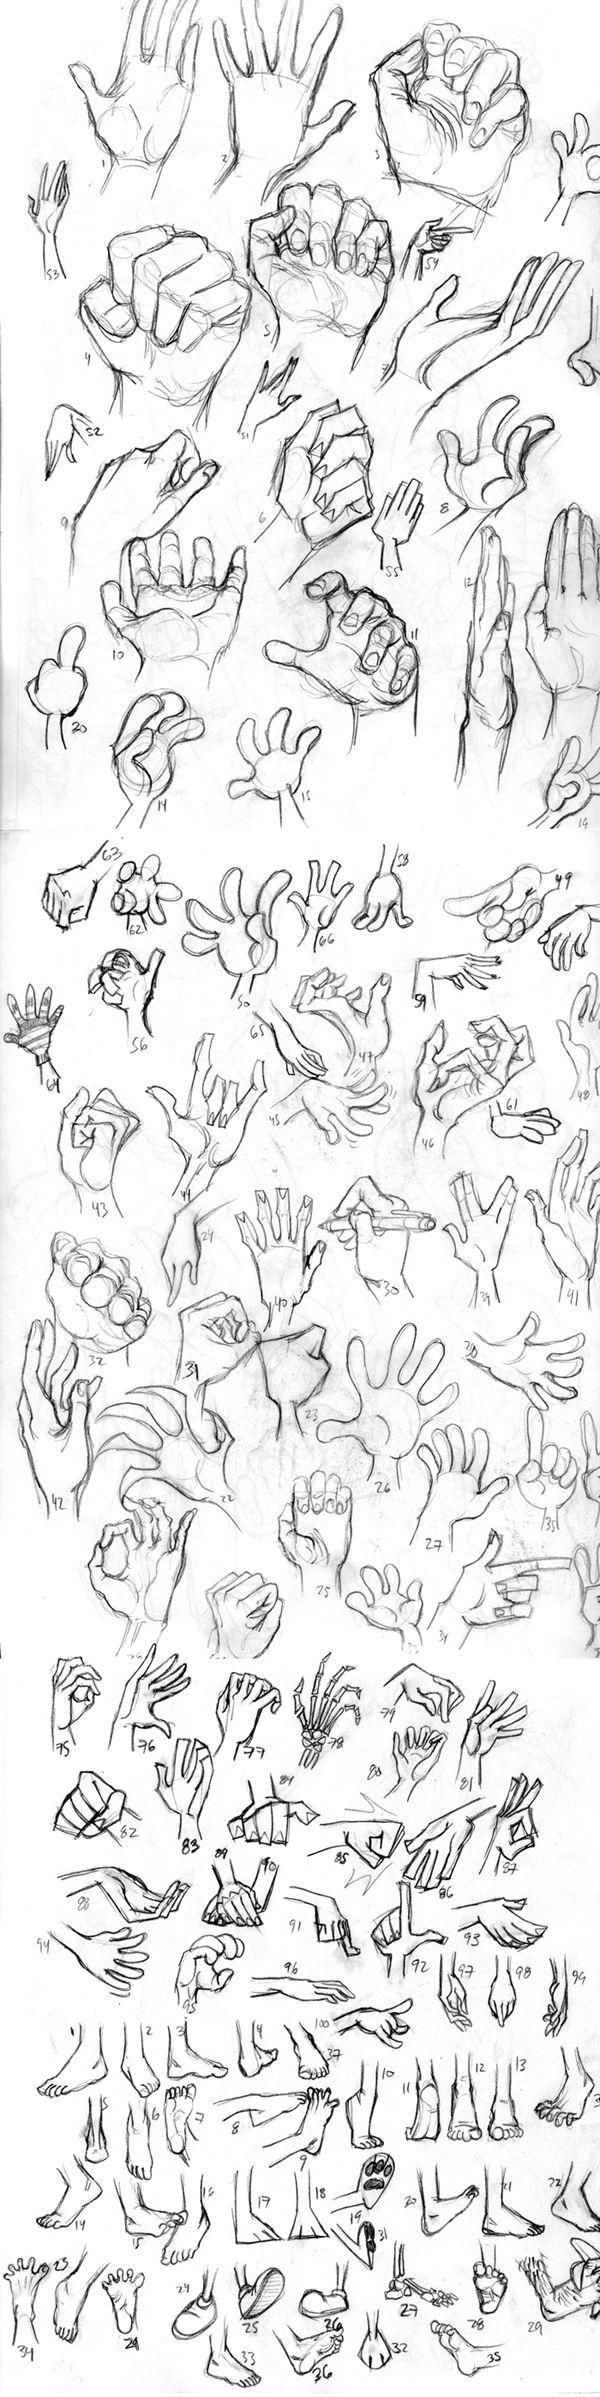 hands feet https://www.facebook.com/CharacterDesignReferences